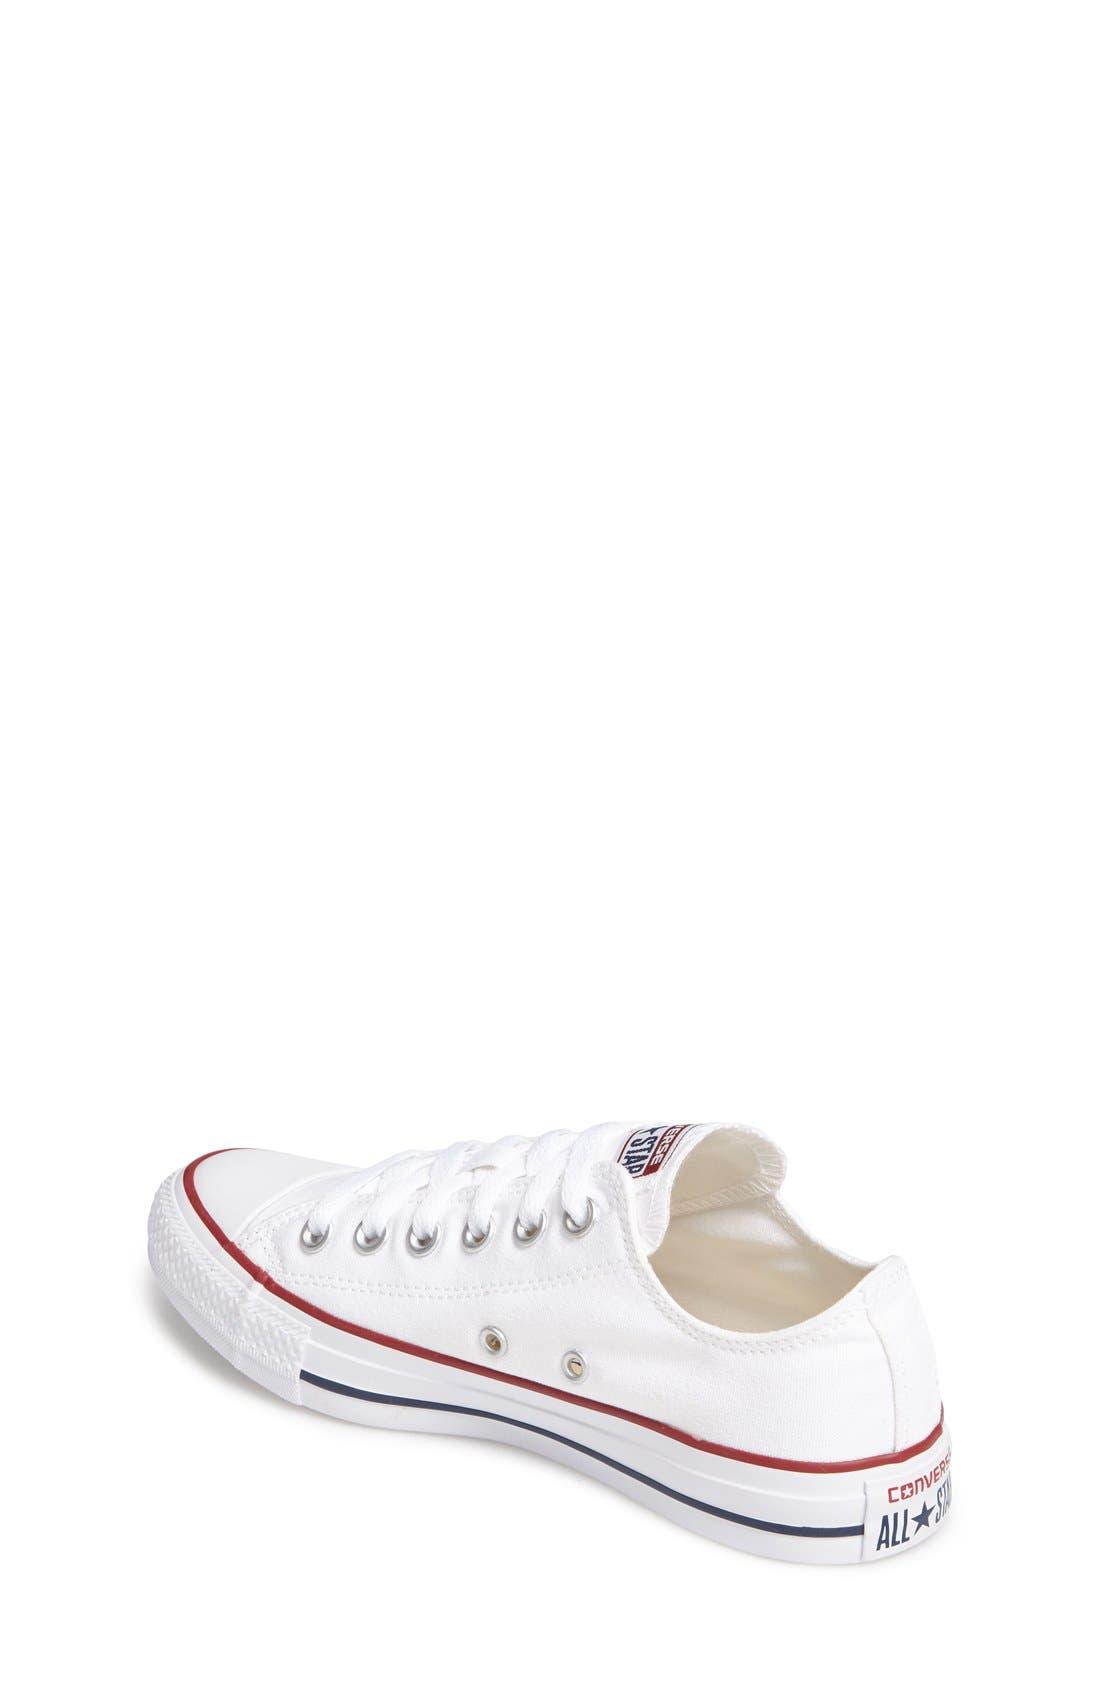 e293f3e3f6ad Little Girls' Shoes | Nordstrom